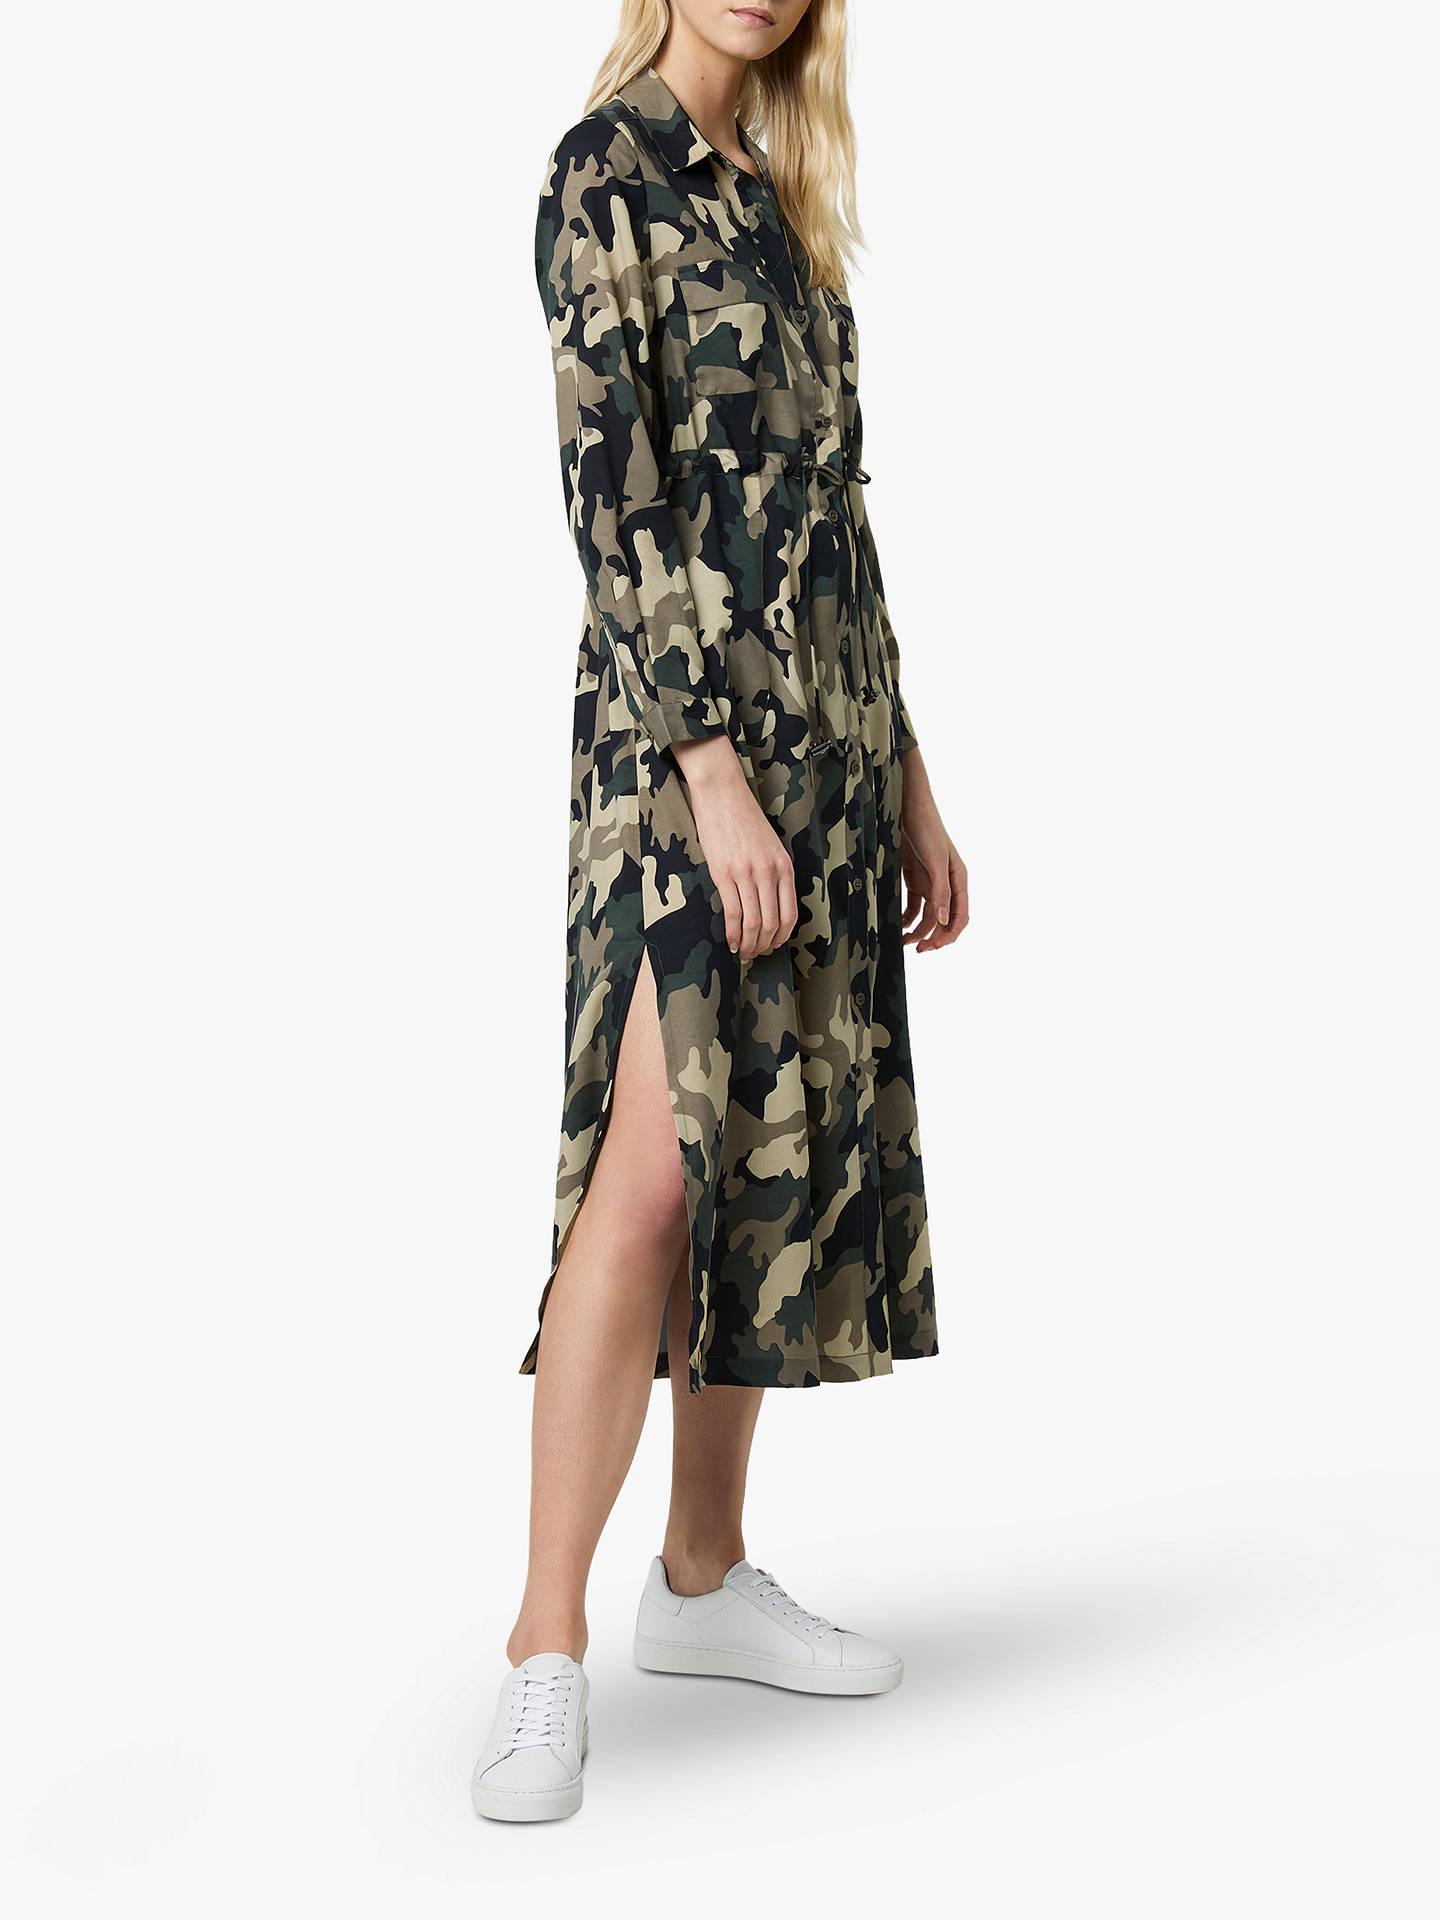 8672cc1f786 ... Buy French Connection Camo Midi Shirt Dress